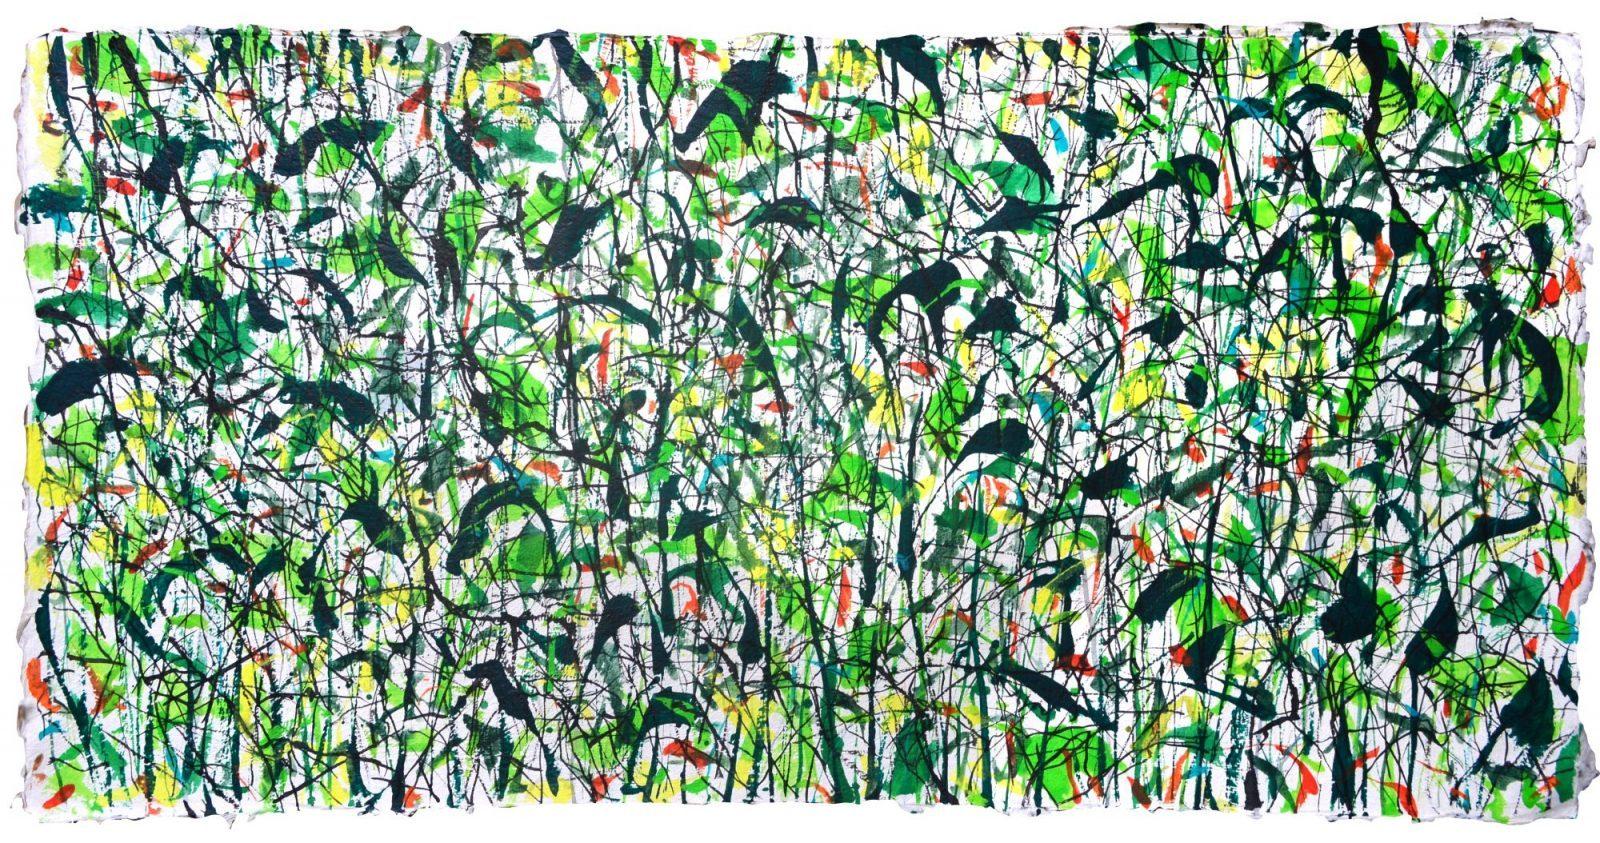 franyo aatoth: Garden Series 1.